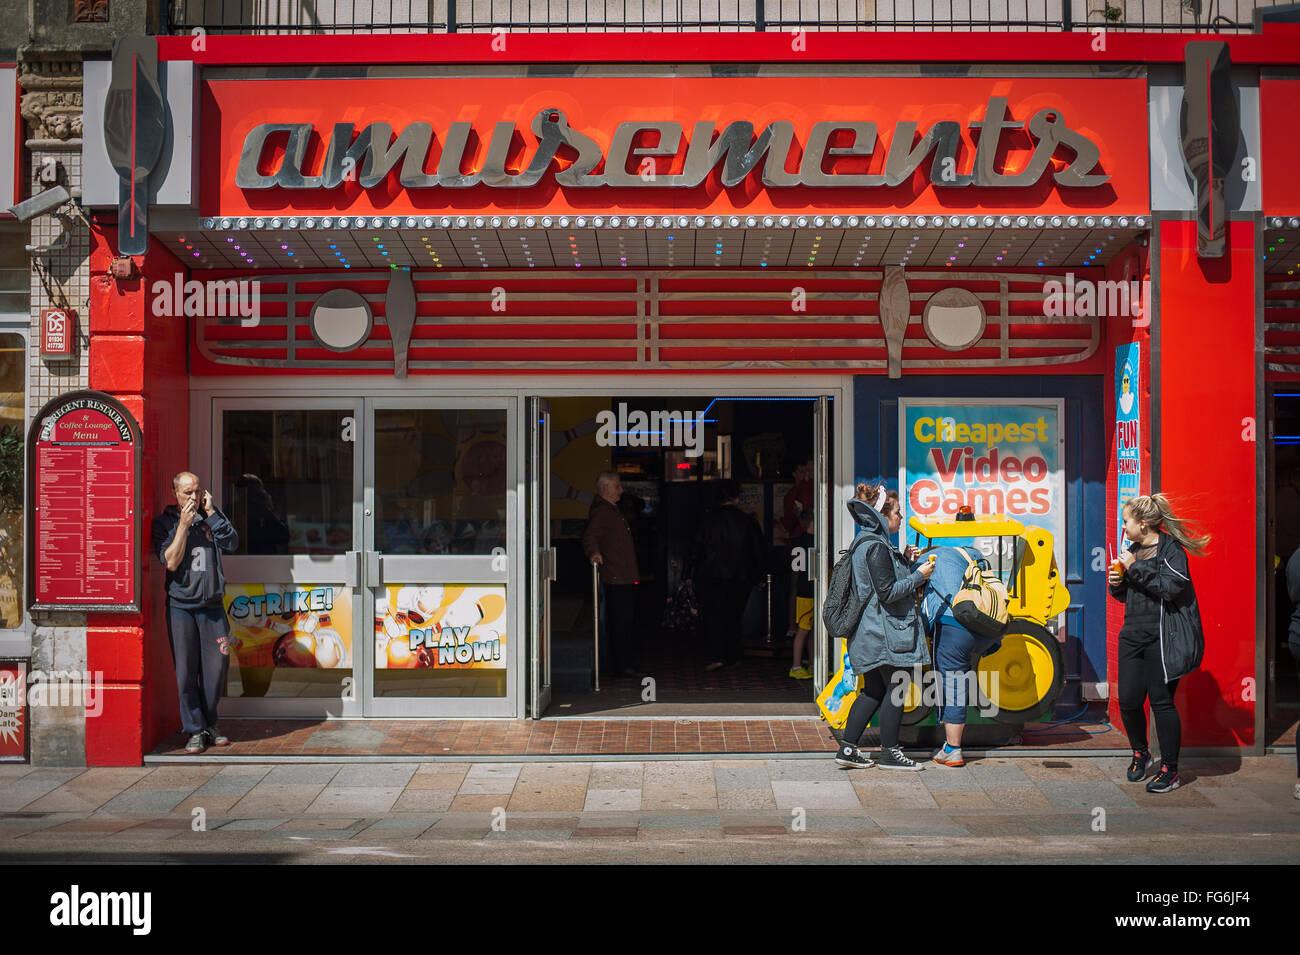 Amusements arcade seaside tourists, Weston-Super-Mare, England - Stock Image